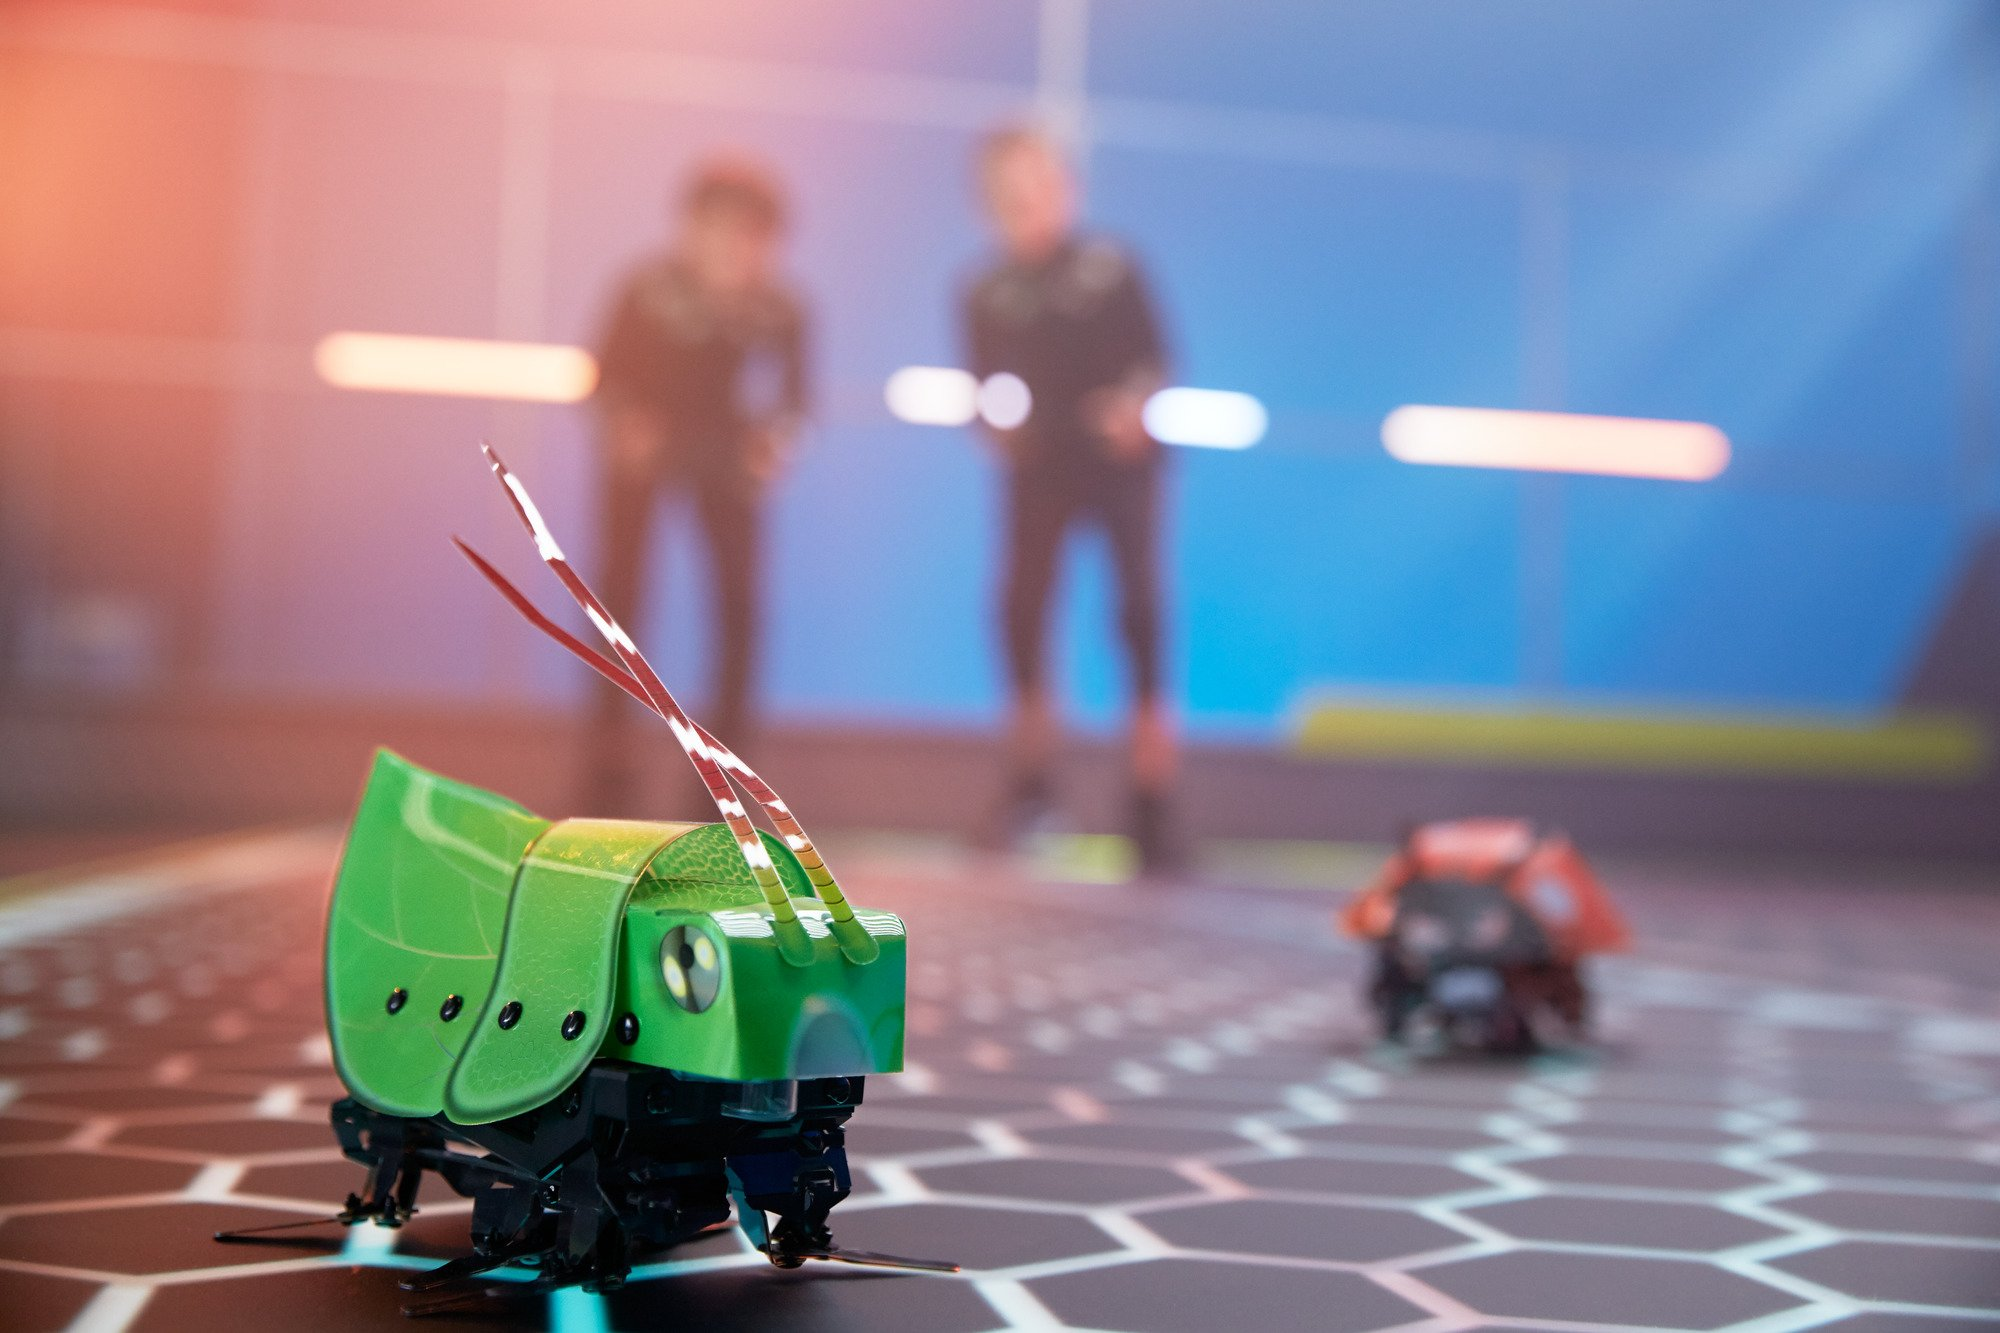 Kamigami Atlasar Robot by Mattel (Image #14)